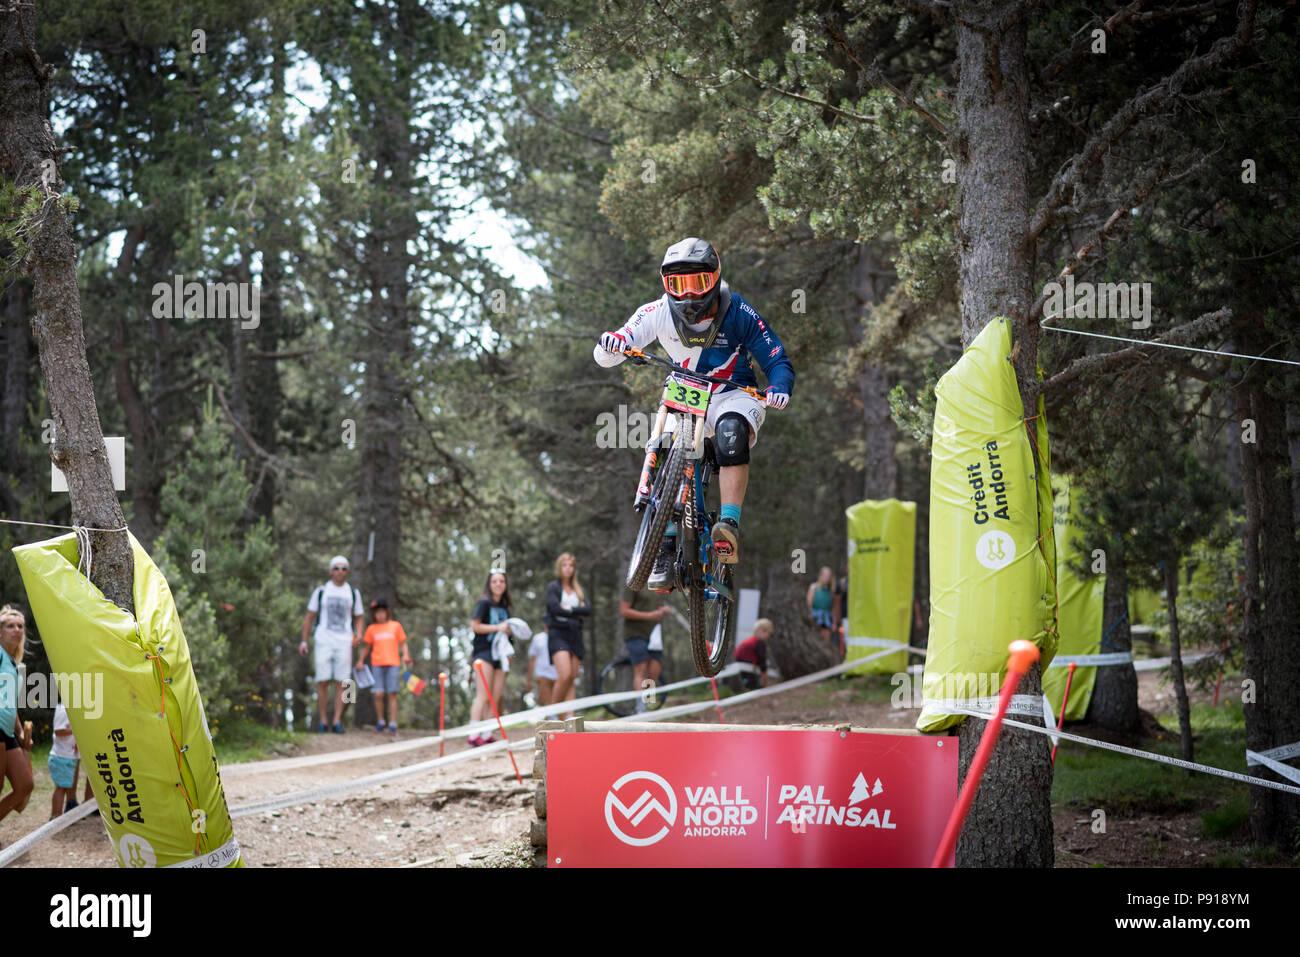 Vallnord, Andorra, 13 July 2018. 2018 World Cup UCI Vallnord Andorra Credit: Martin Silva Cosentino/Alamy Live News - Stock Image